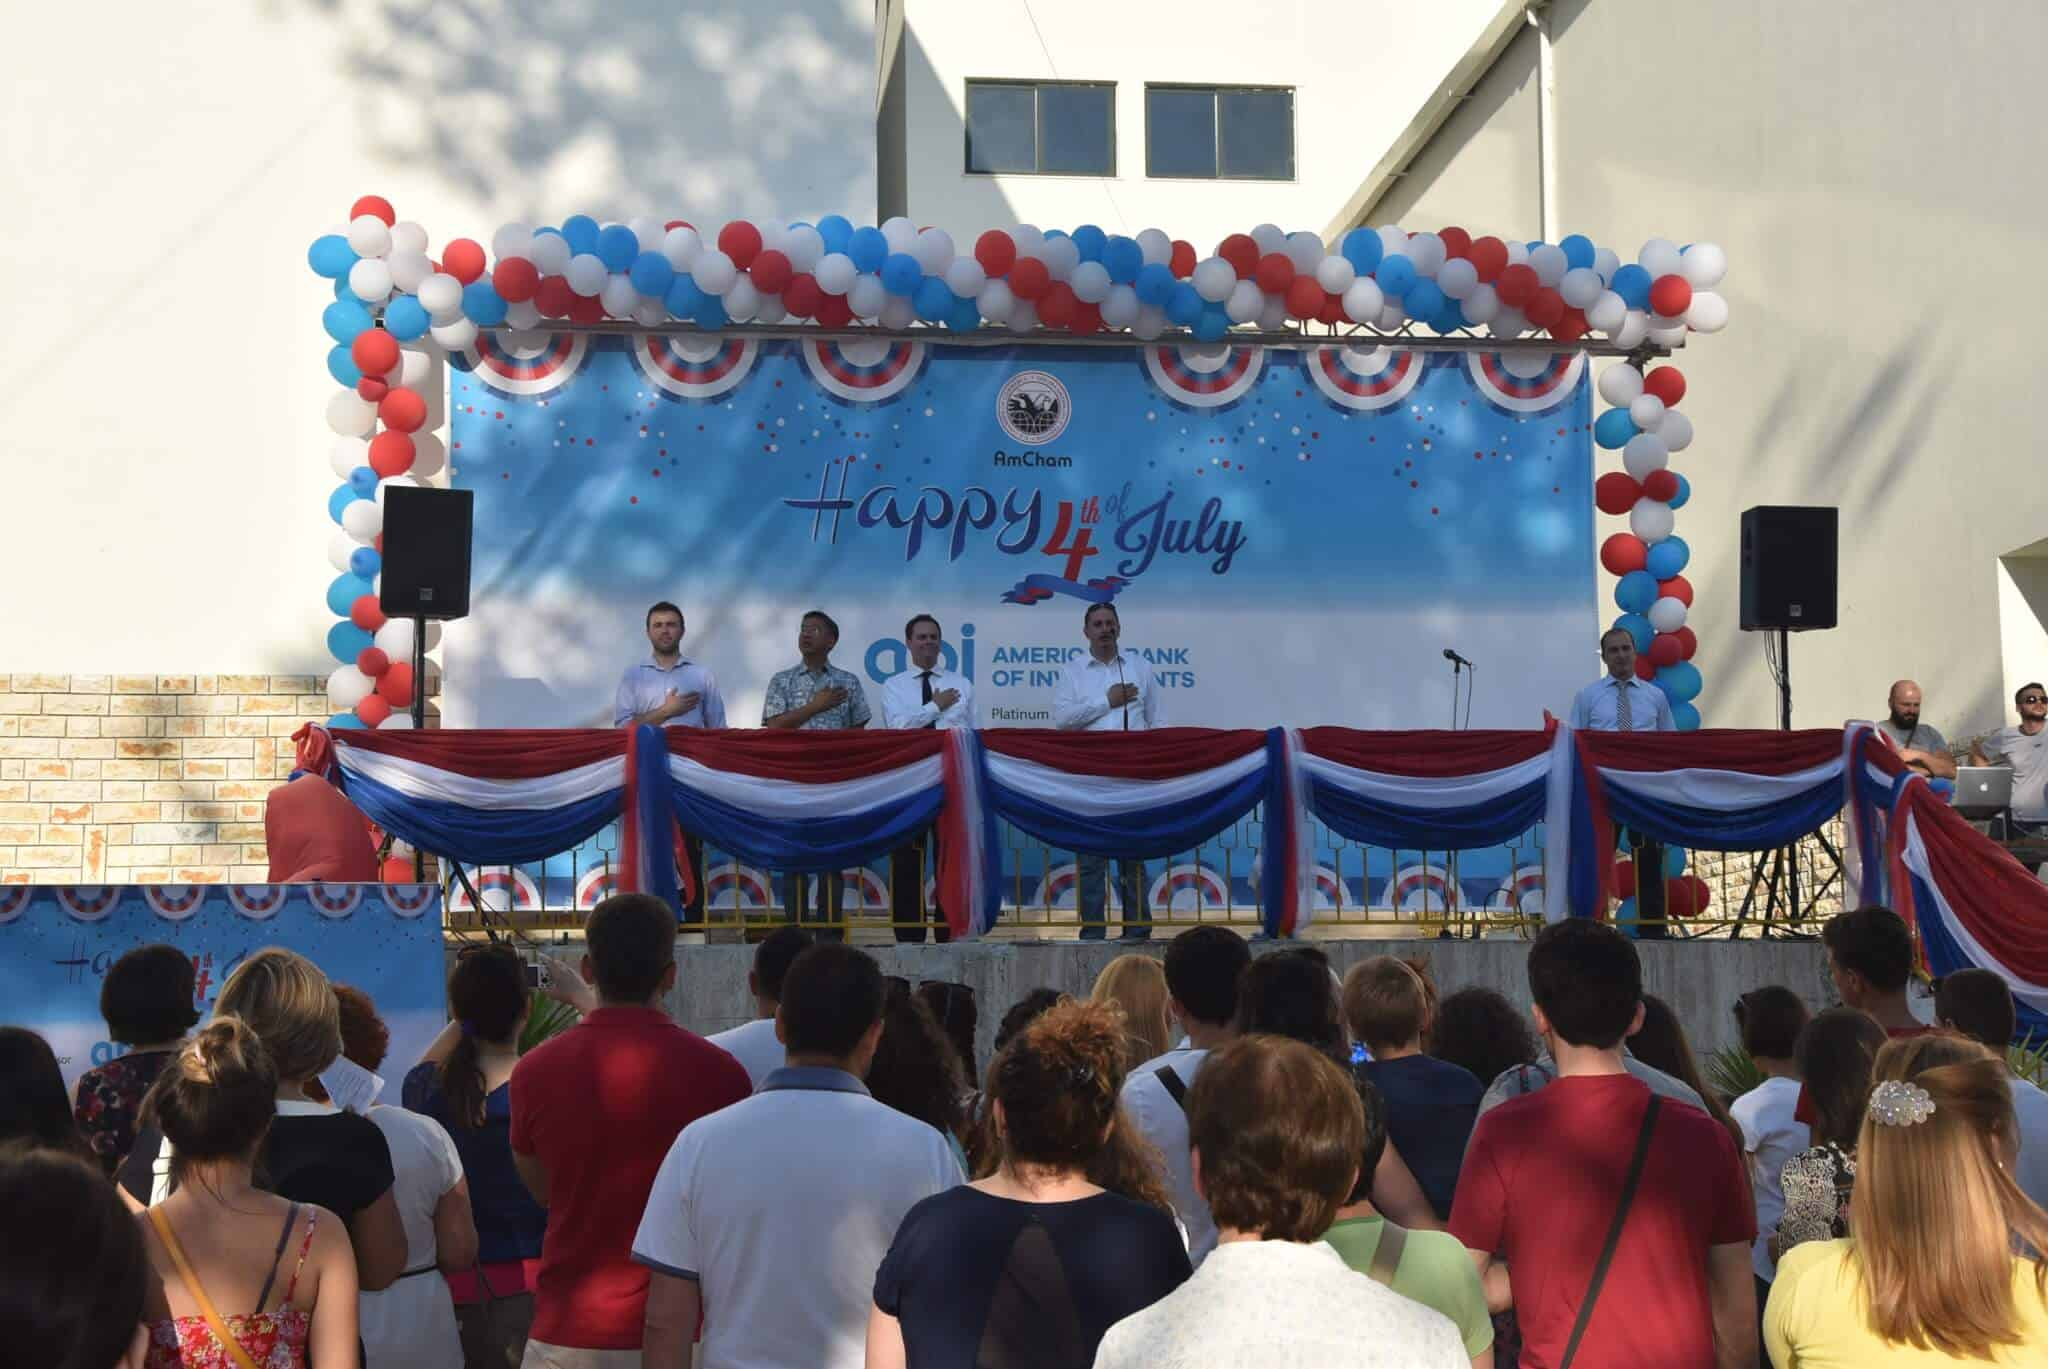 Singing the American National Anthem